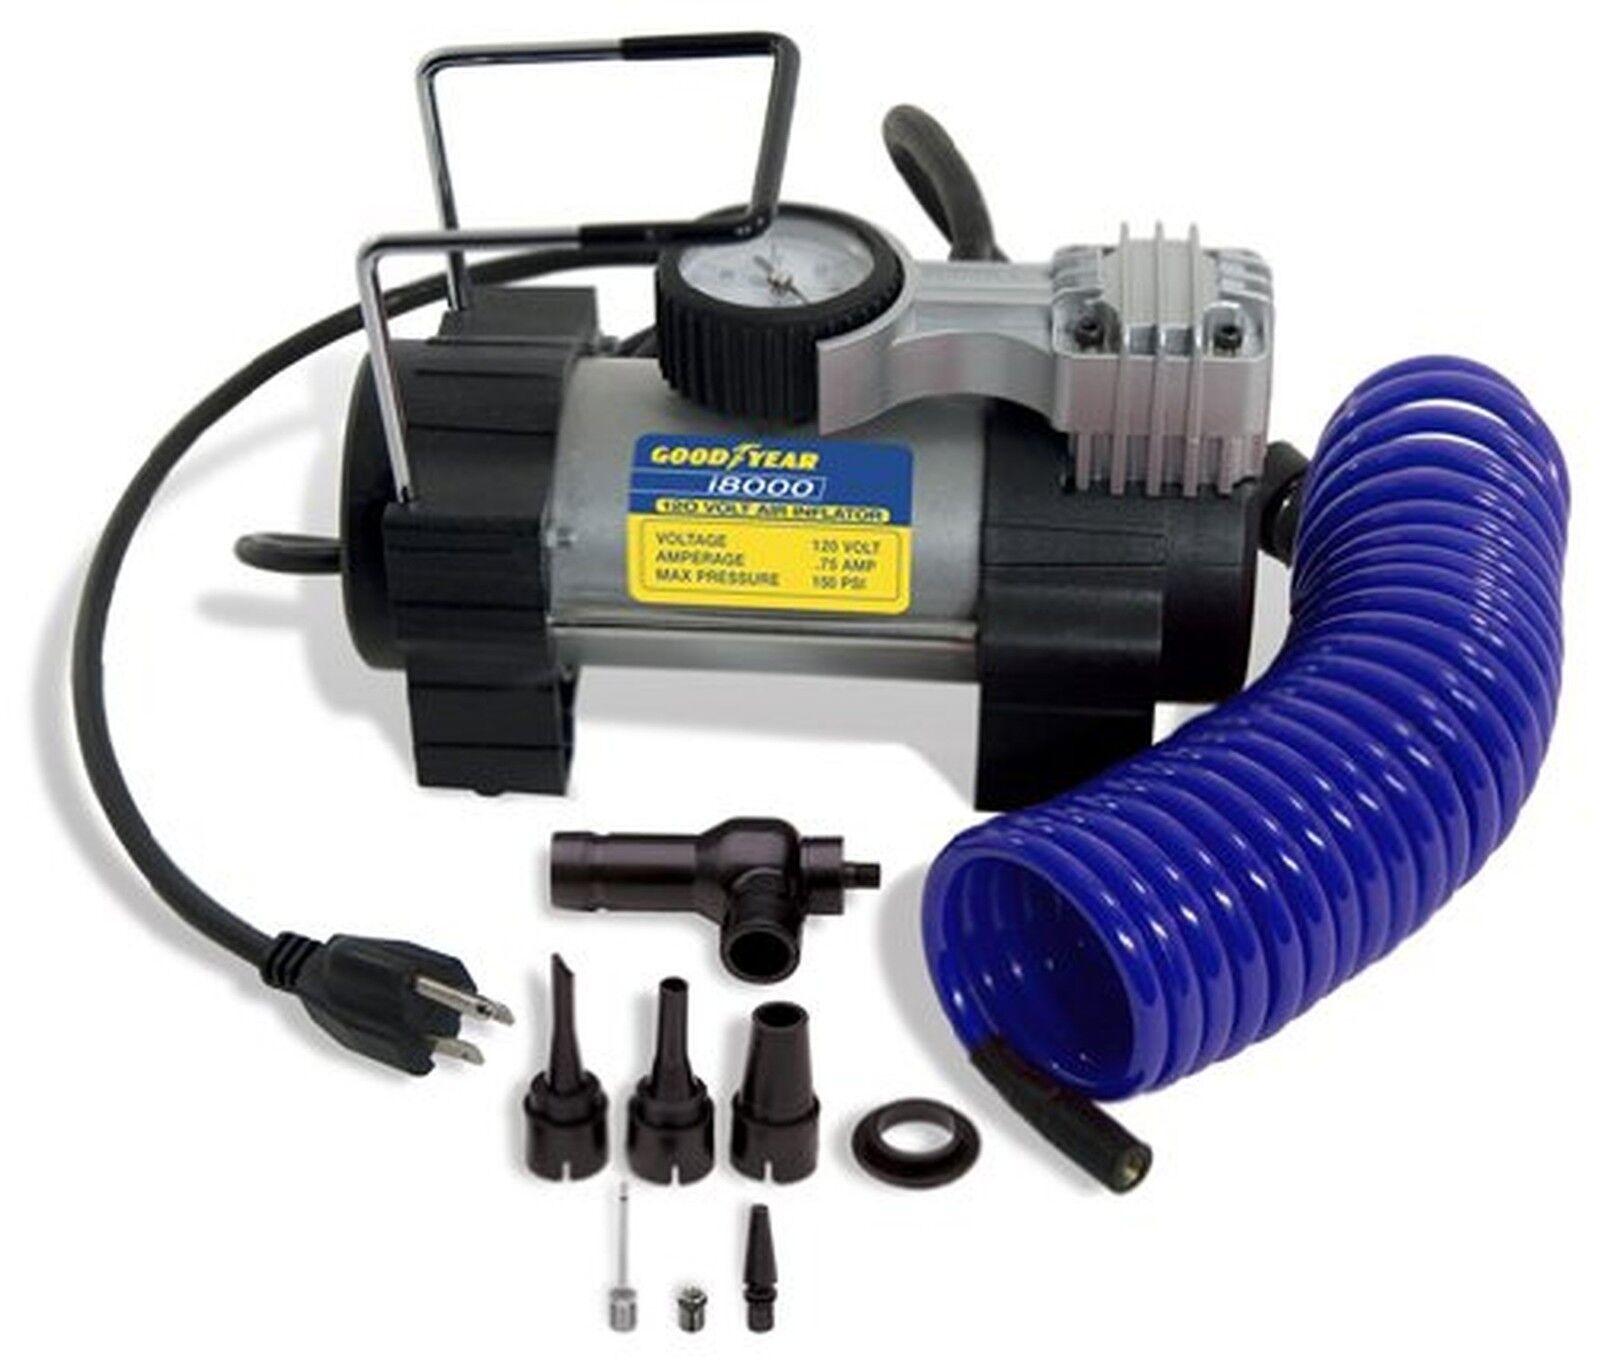 Goodyear i8000 120-Volt Direct Drive Tire Inflator Air Pump Compressor For Car